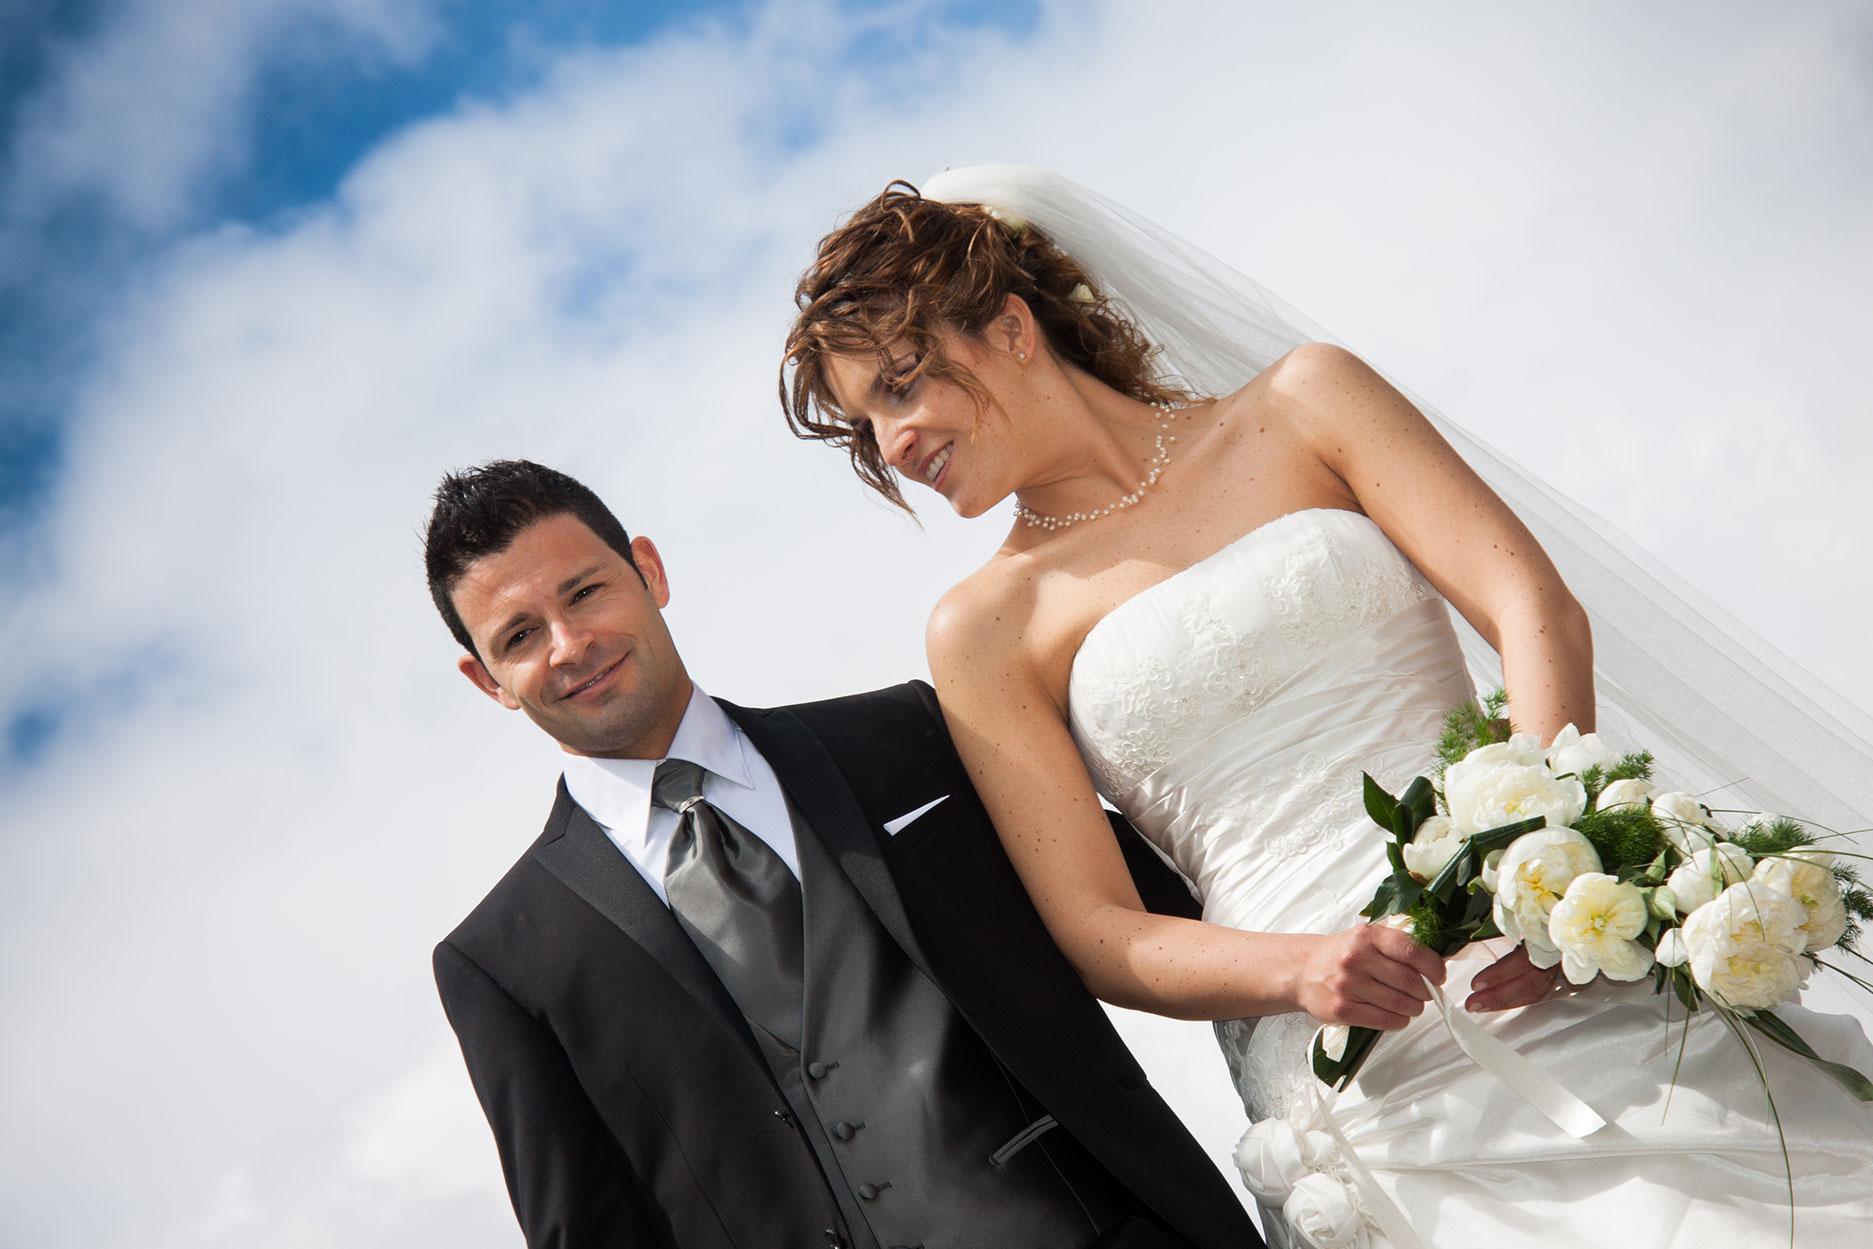 Francesca-Ferrati-wedding-photographer-Verona-Federica-Giovanni23